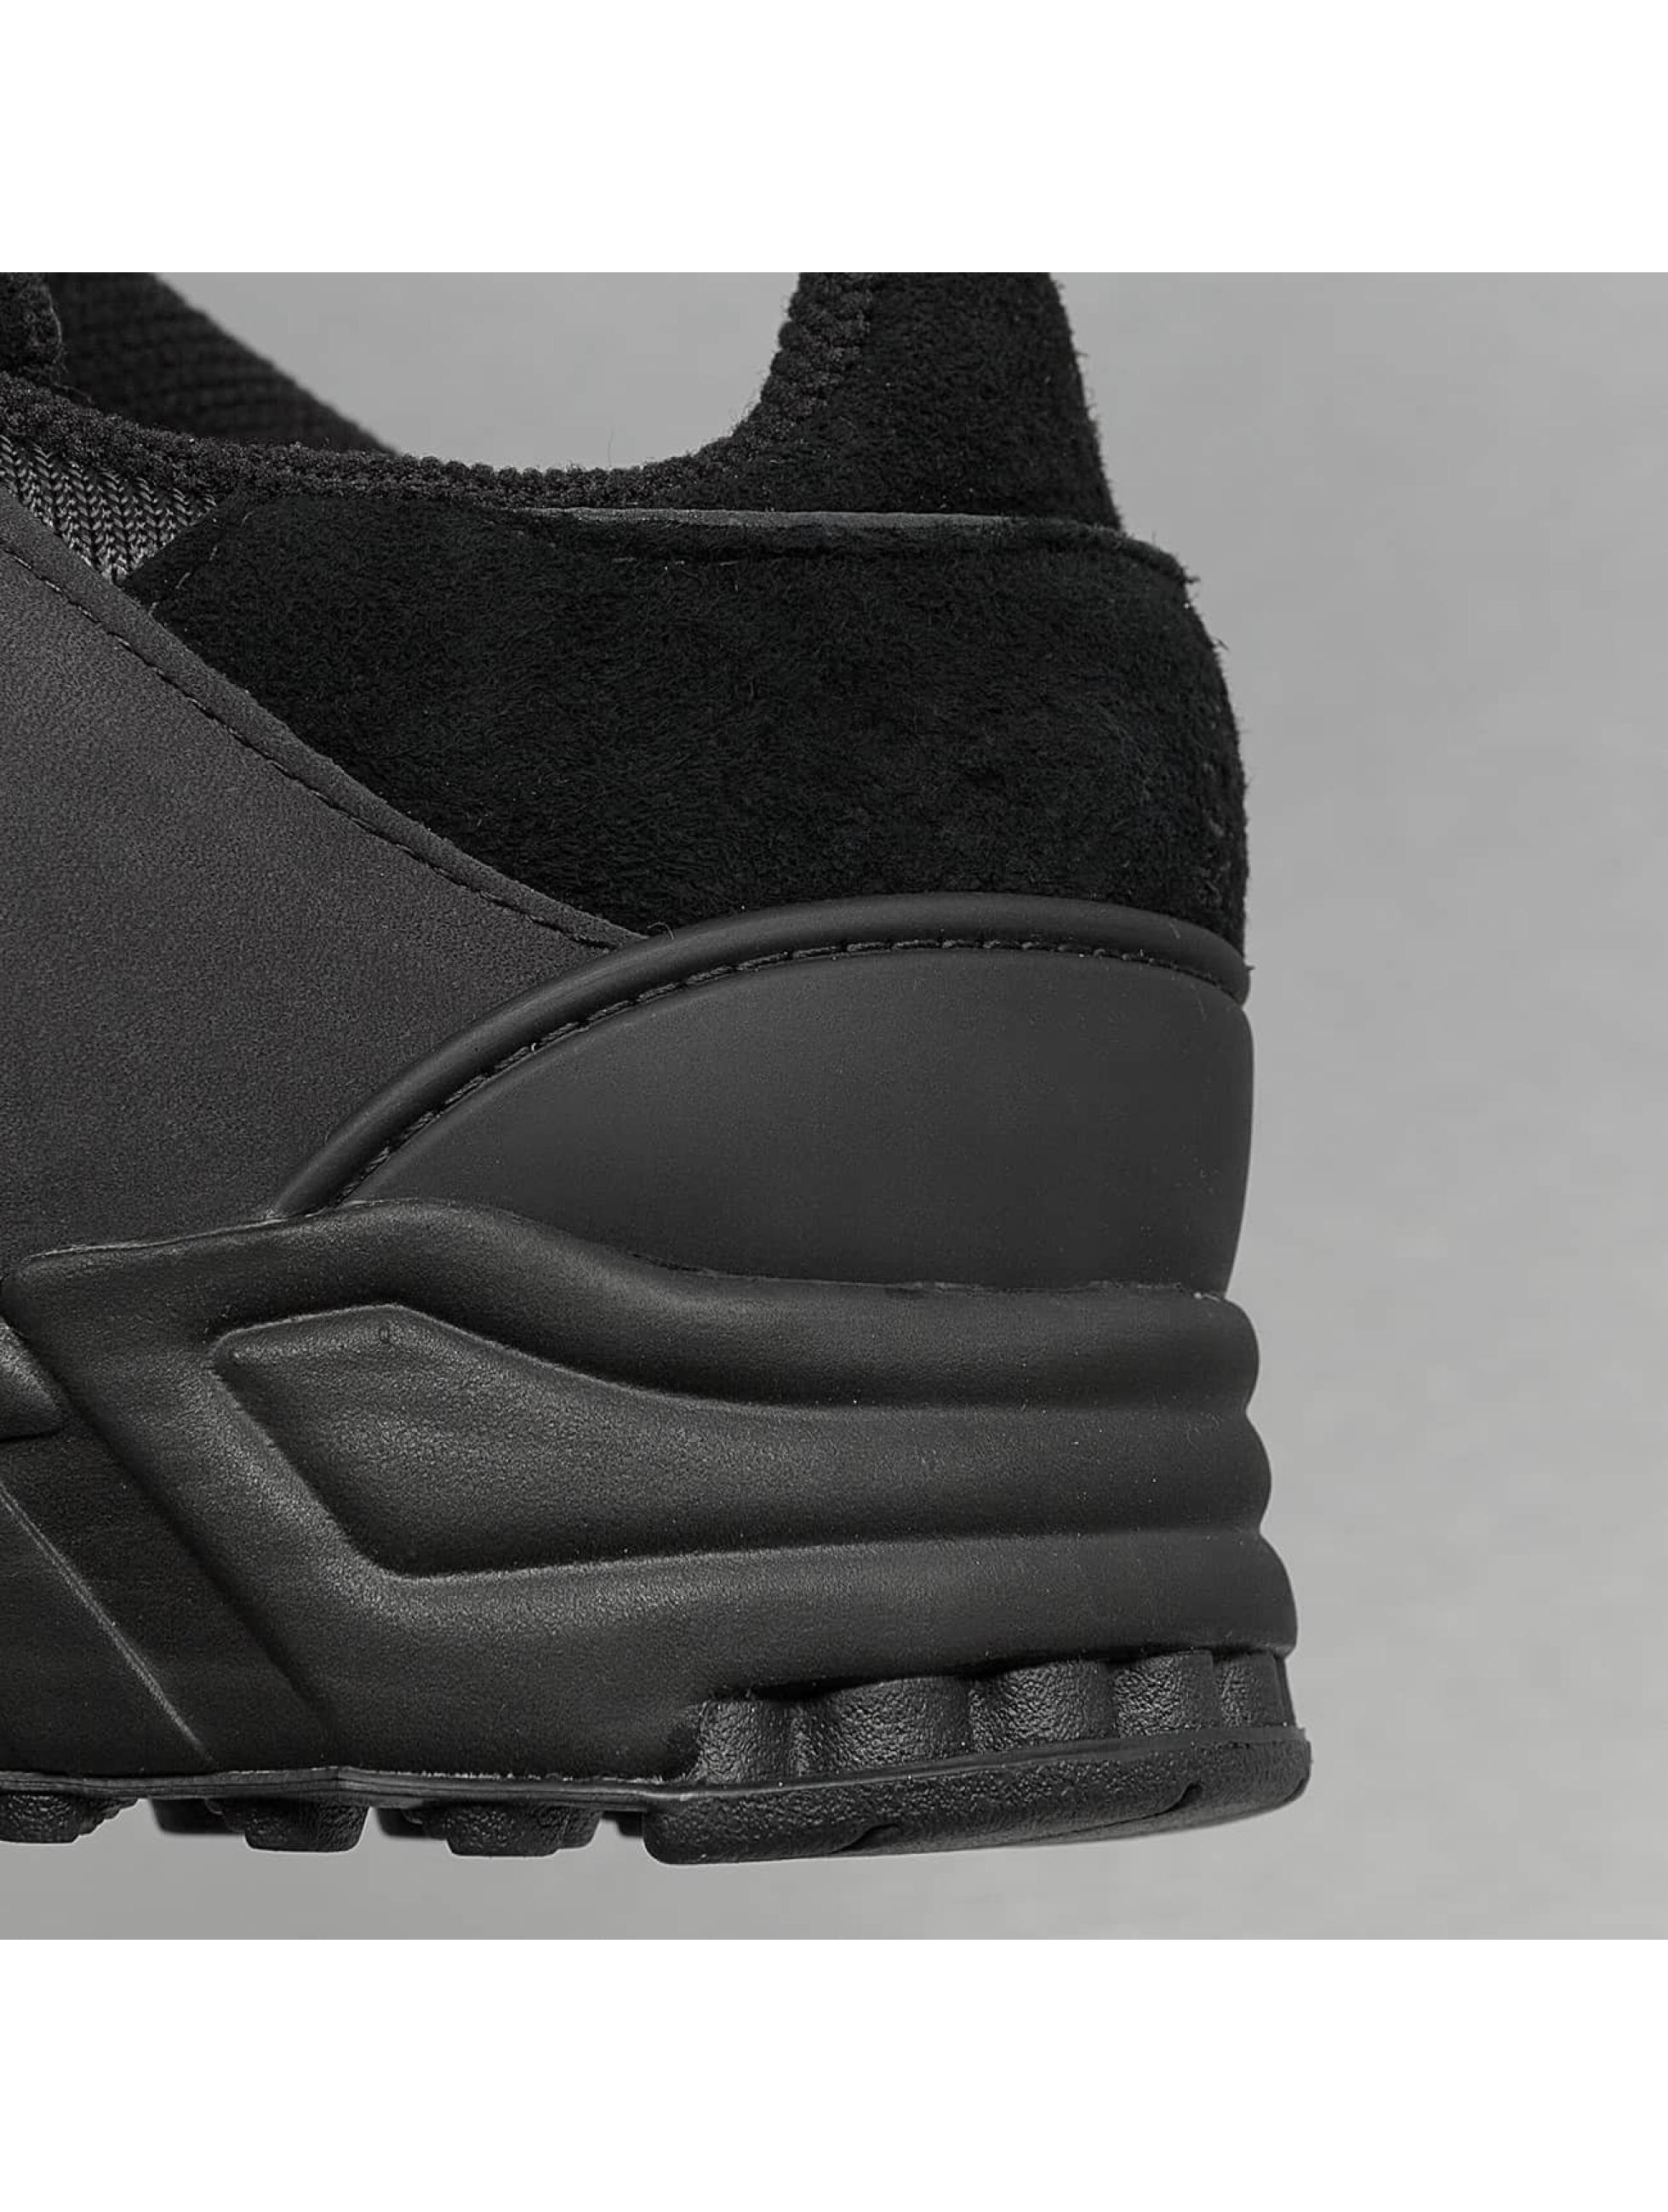 adidas Sneakers Equipment svart